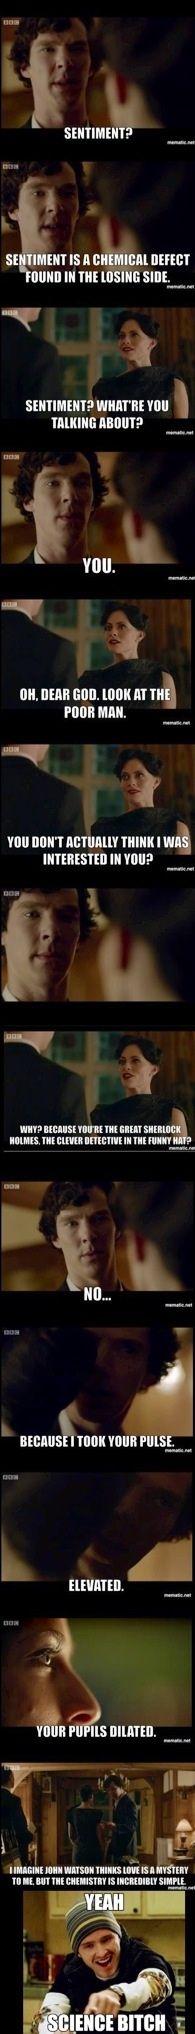 Sherlock & Breaking Bad. Epic